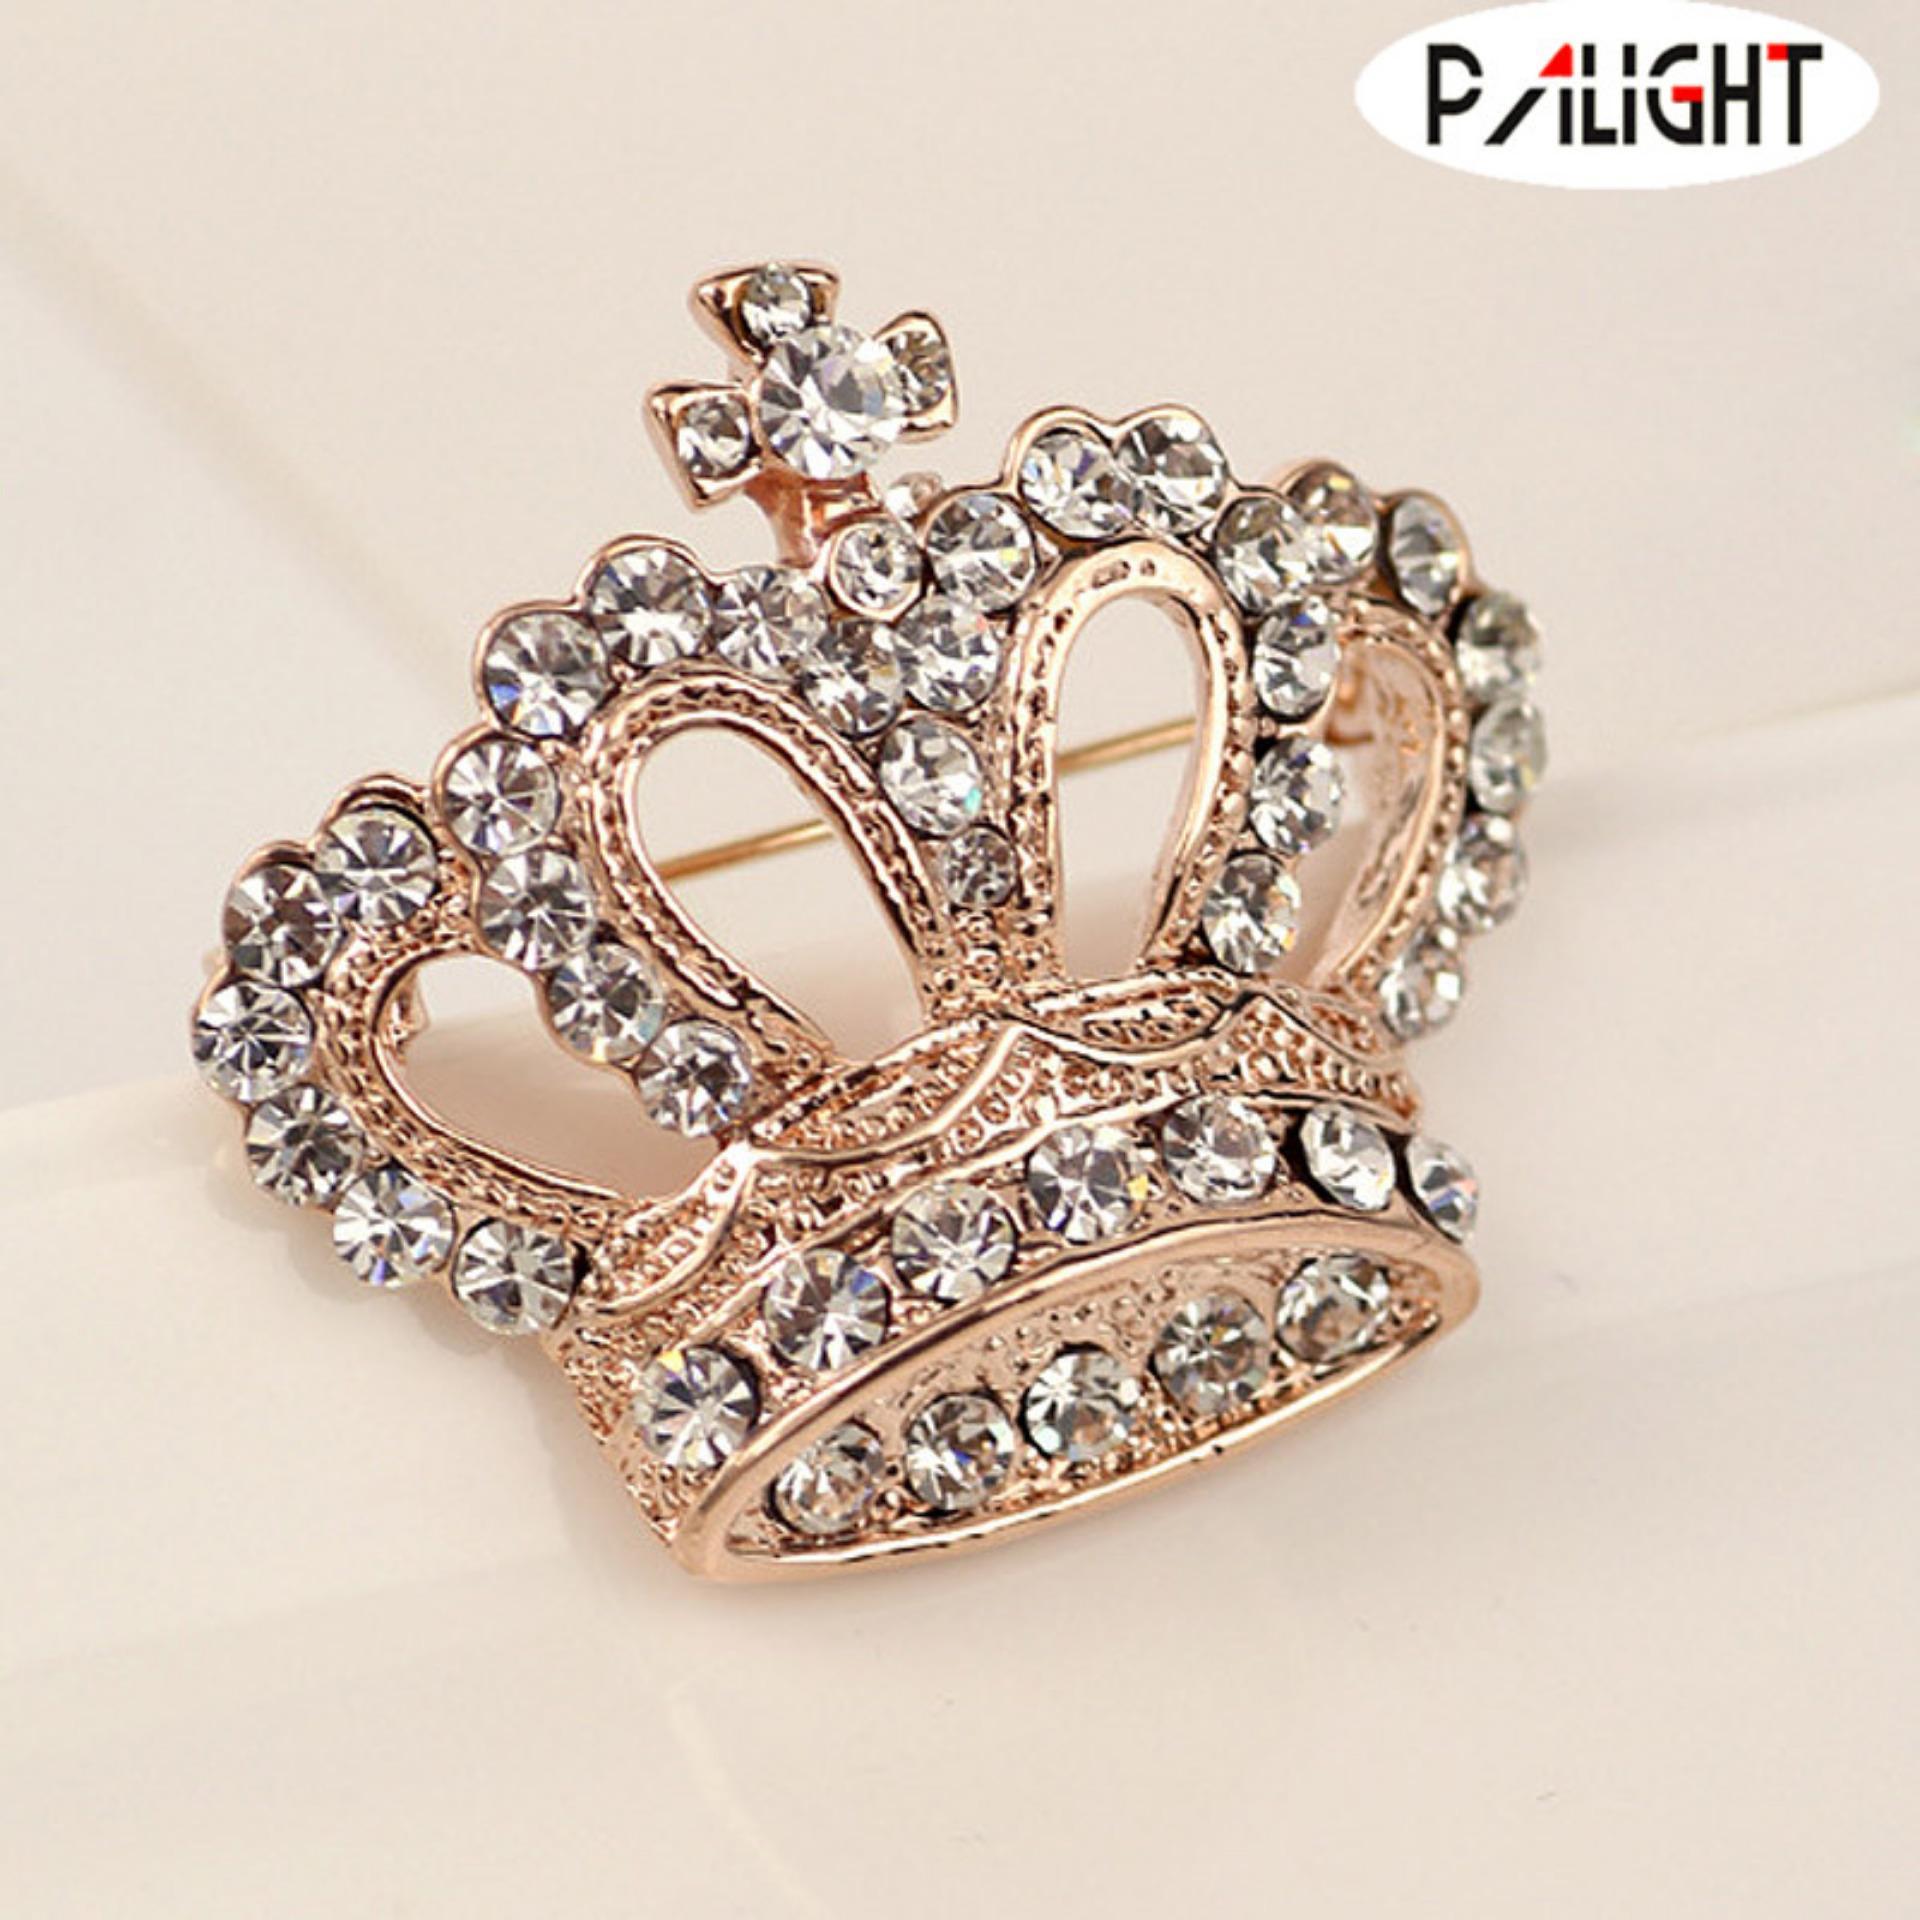 Fashion Wanita Bros Diamond Bentuk Mahkota Gaun, Jadilah Yang Pertama Mengulas! By Palight.